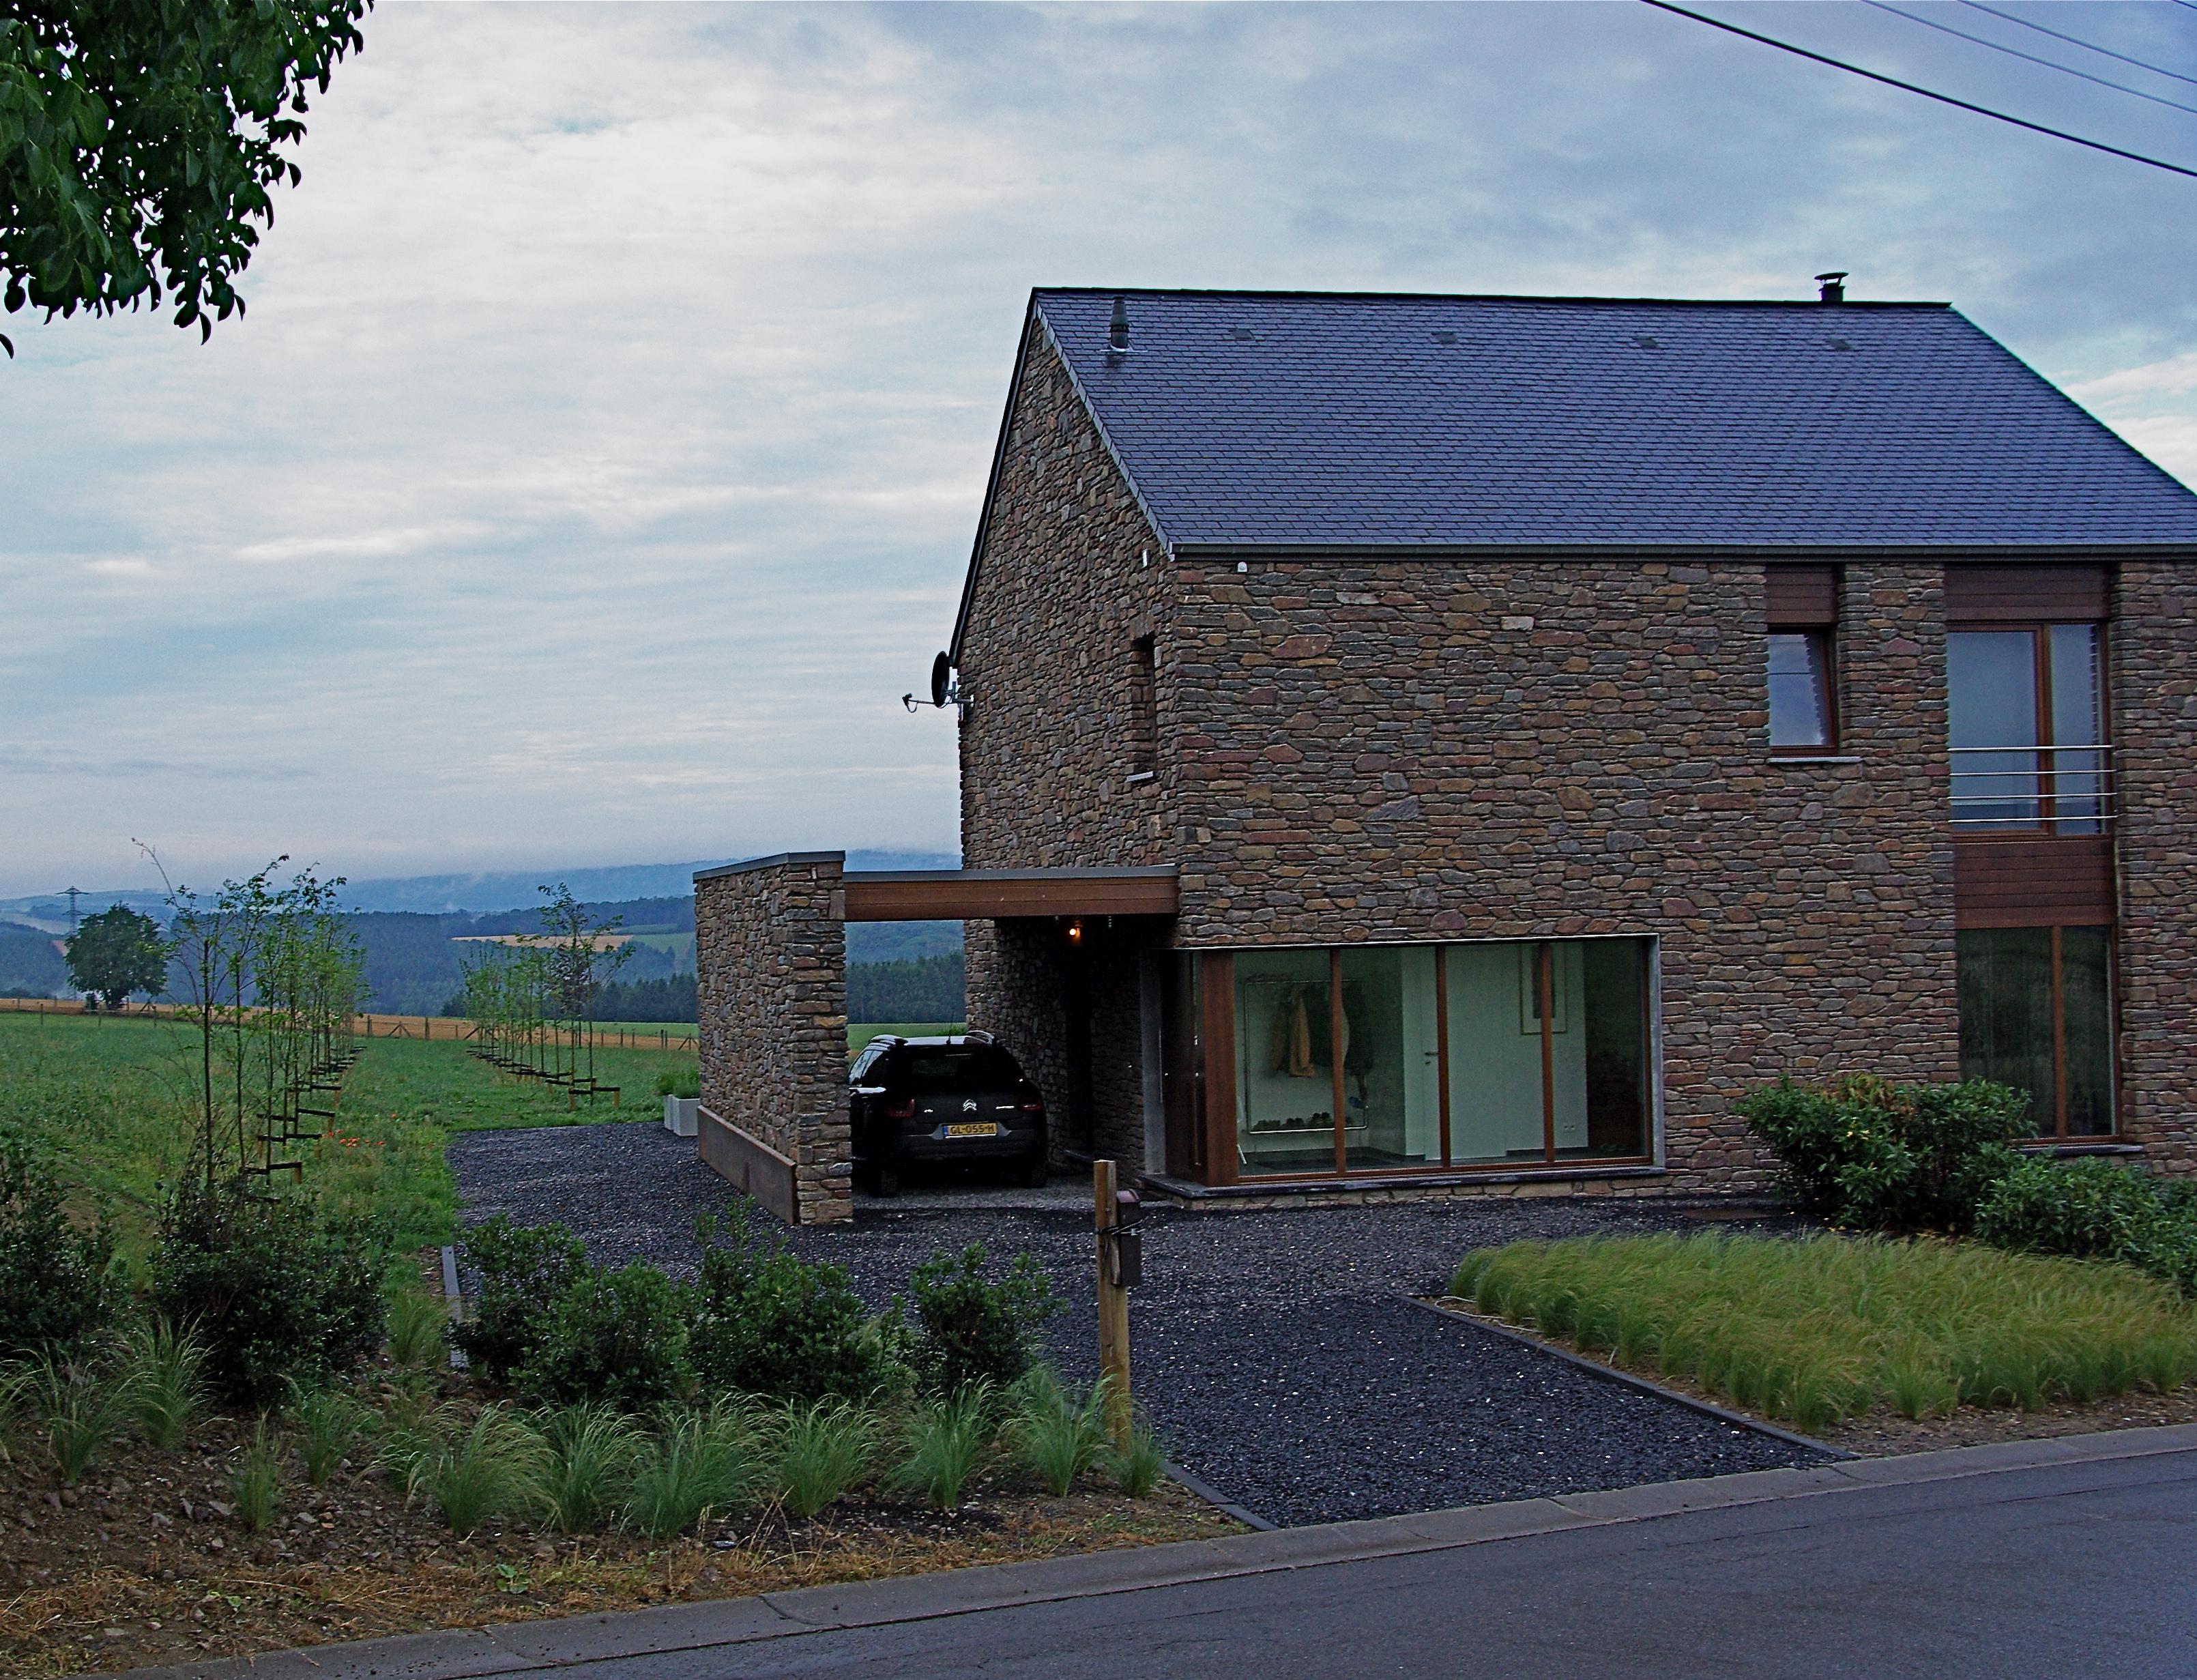 File:ardeens huis in cielle moderne architectuur.jpg wikimedia